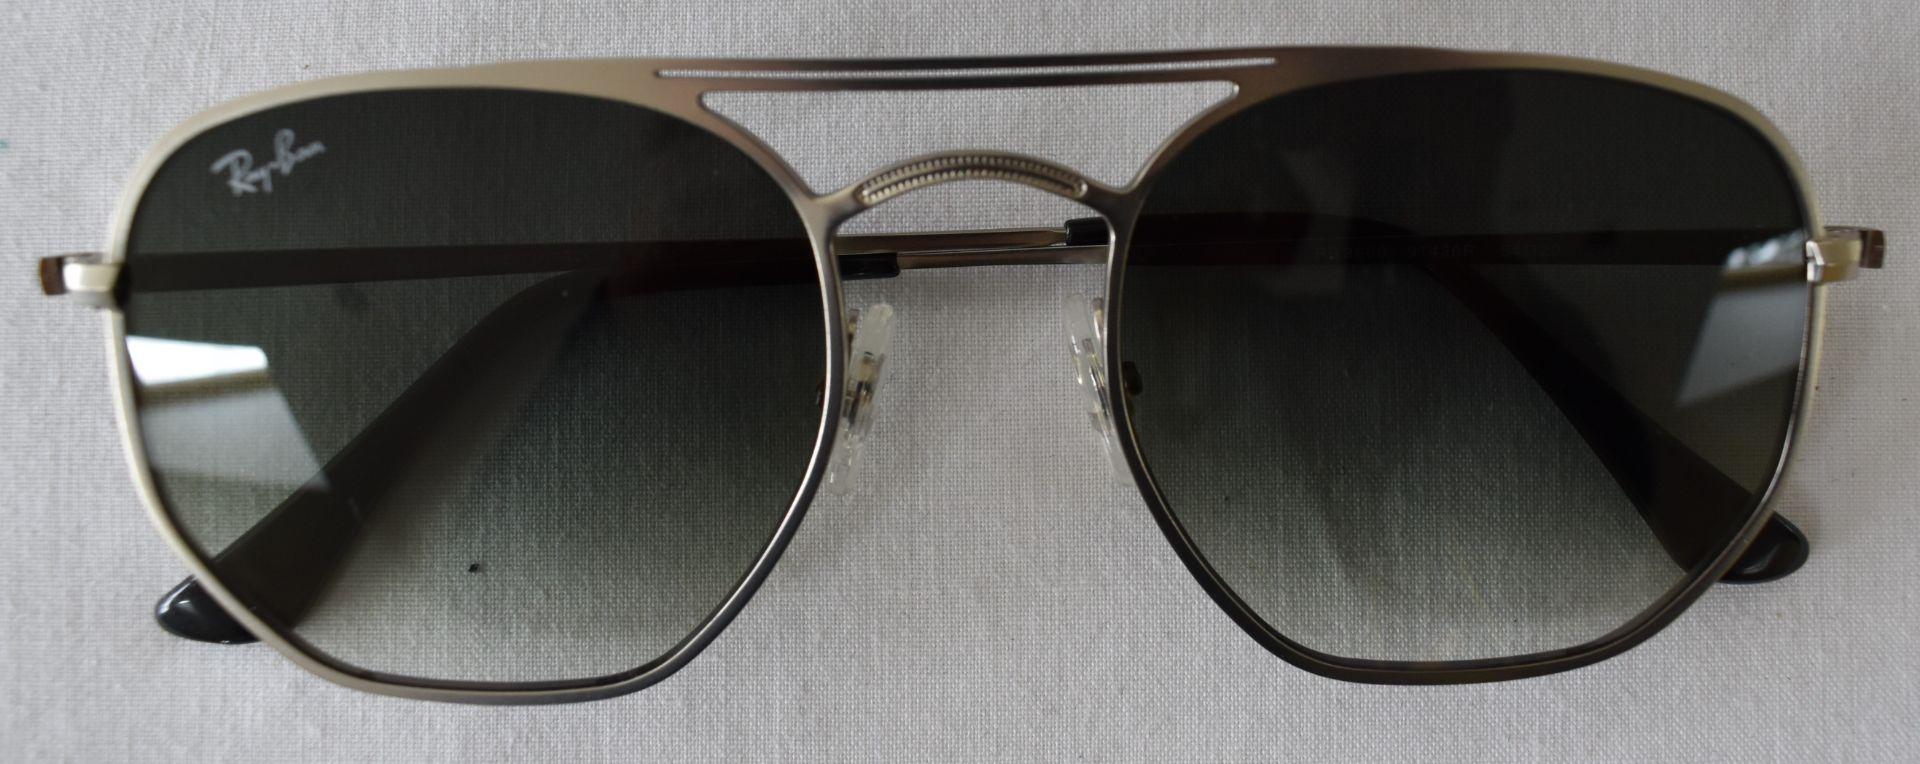 Ray Ban Sunglasses ORB3609N 91420R *3N - Image 2 of 3